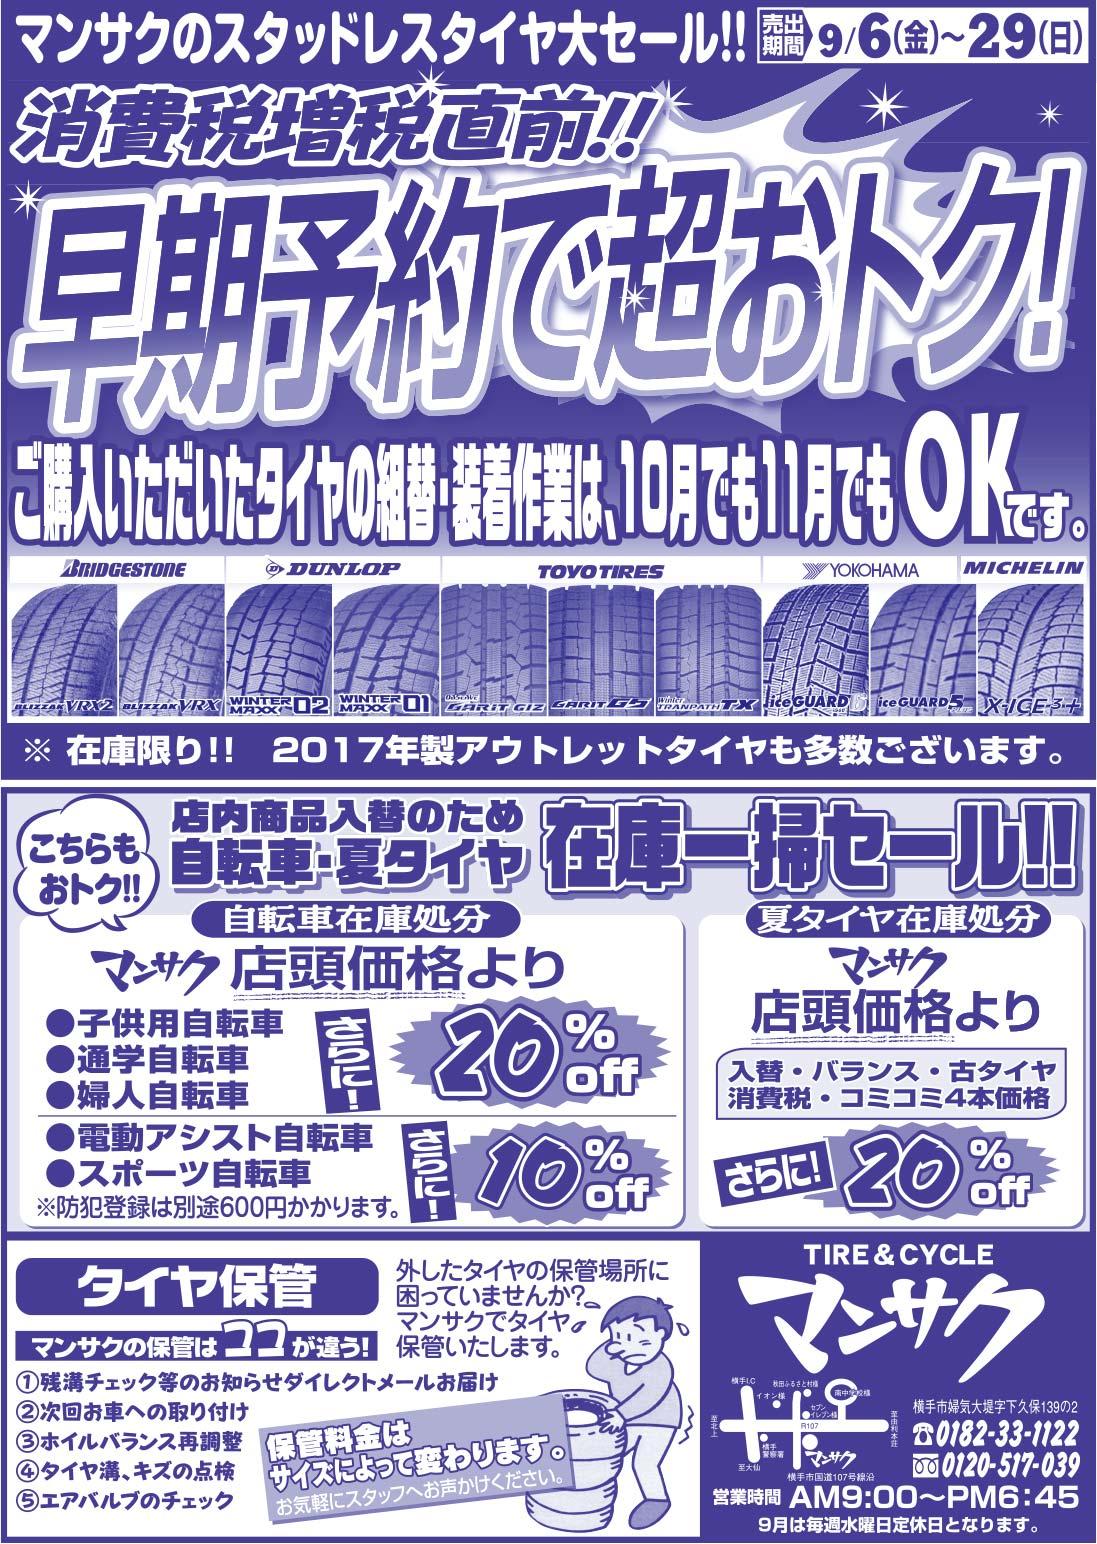 TIRE&CYCLE マンサク様の2019.09.06号広告